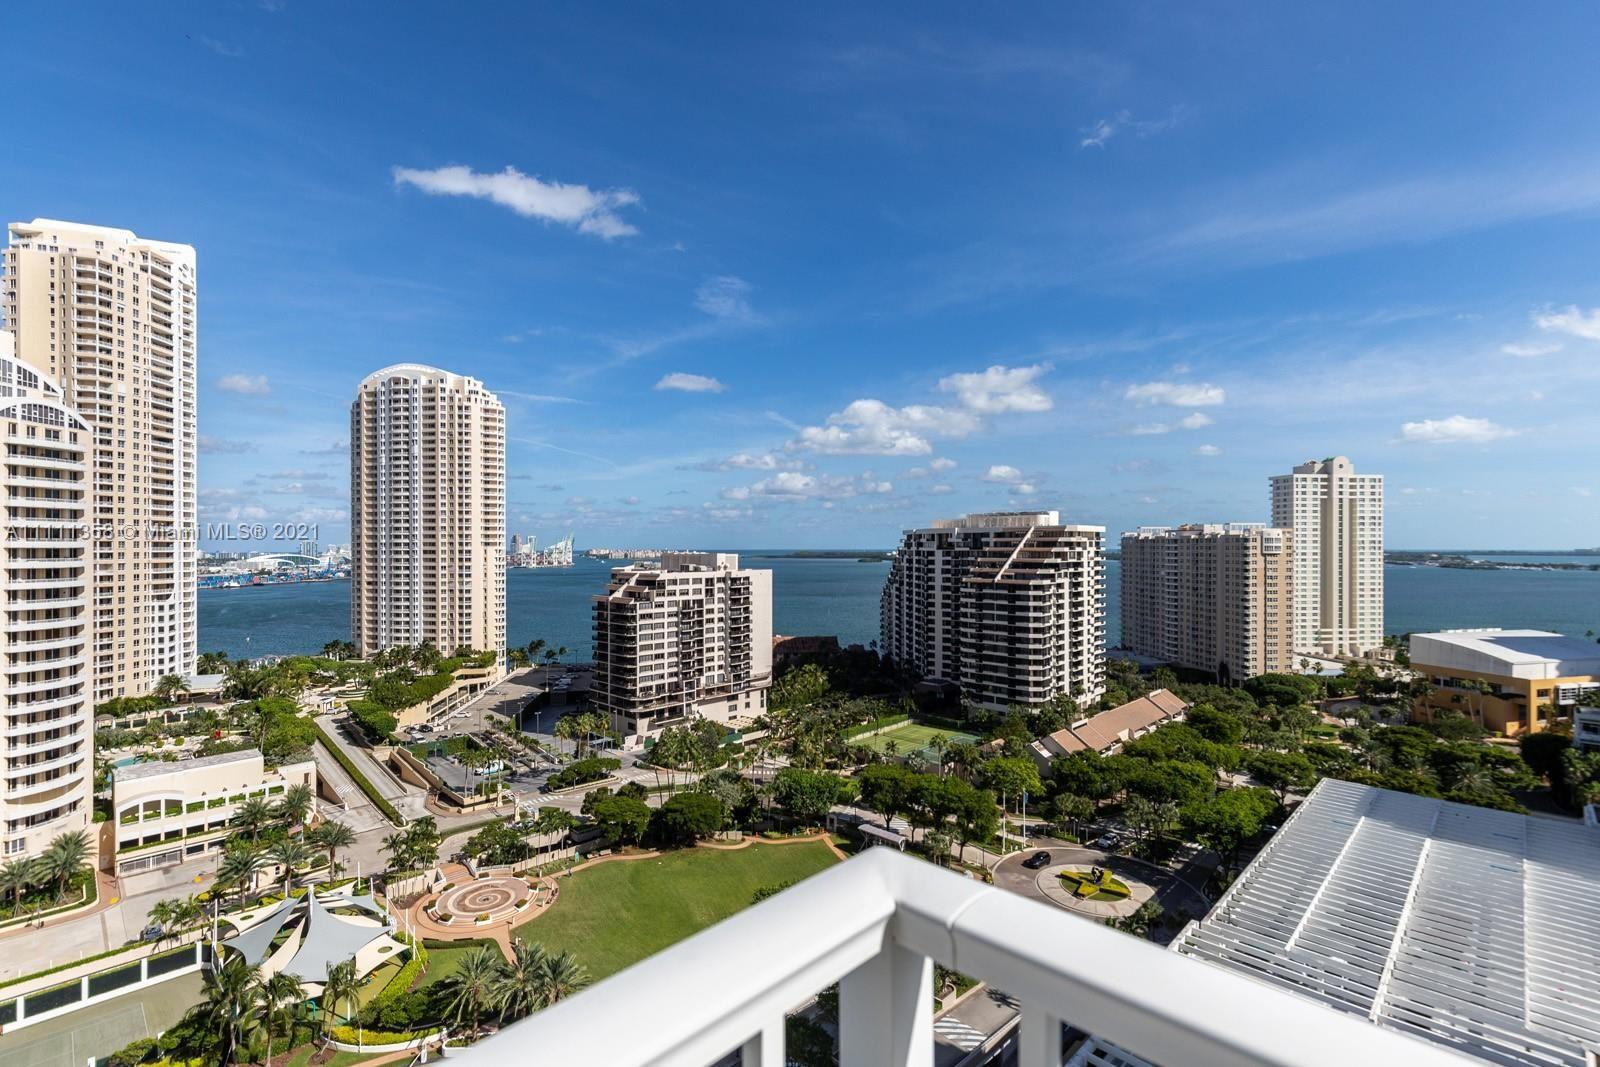 801 Brickell Key Blvd #2011, Miami, FL 33131 - #: A11111358